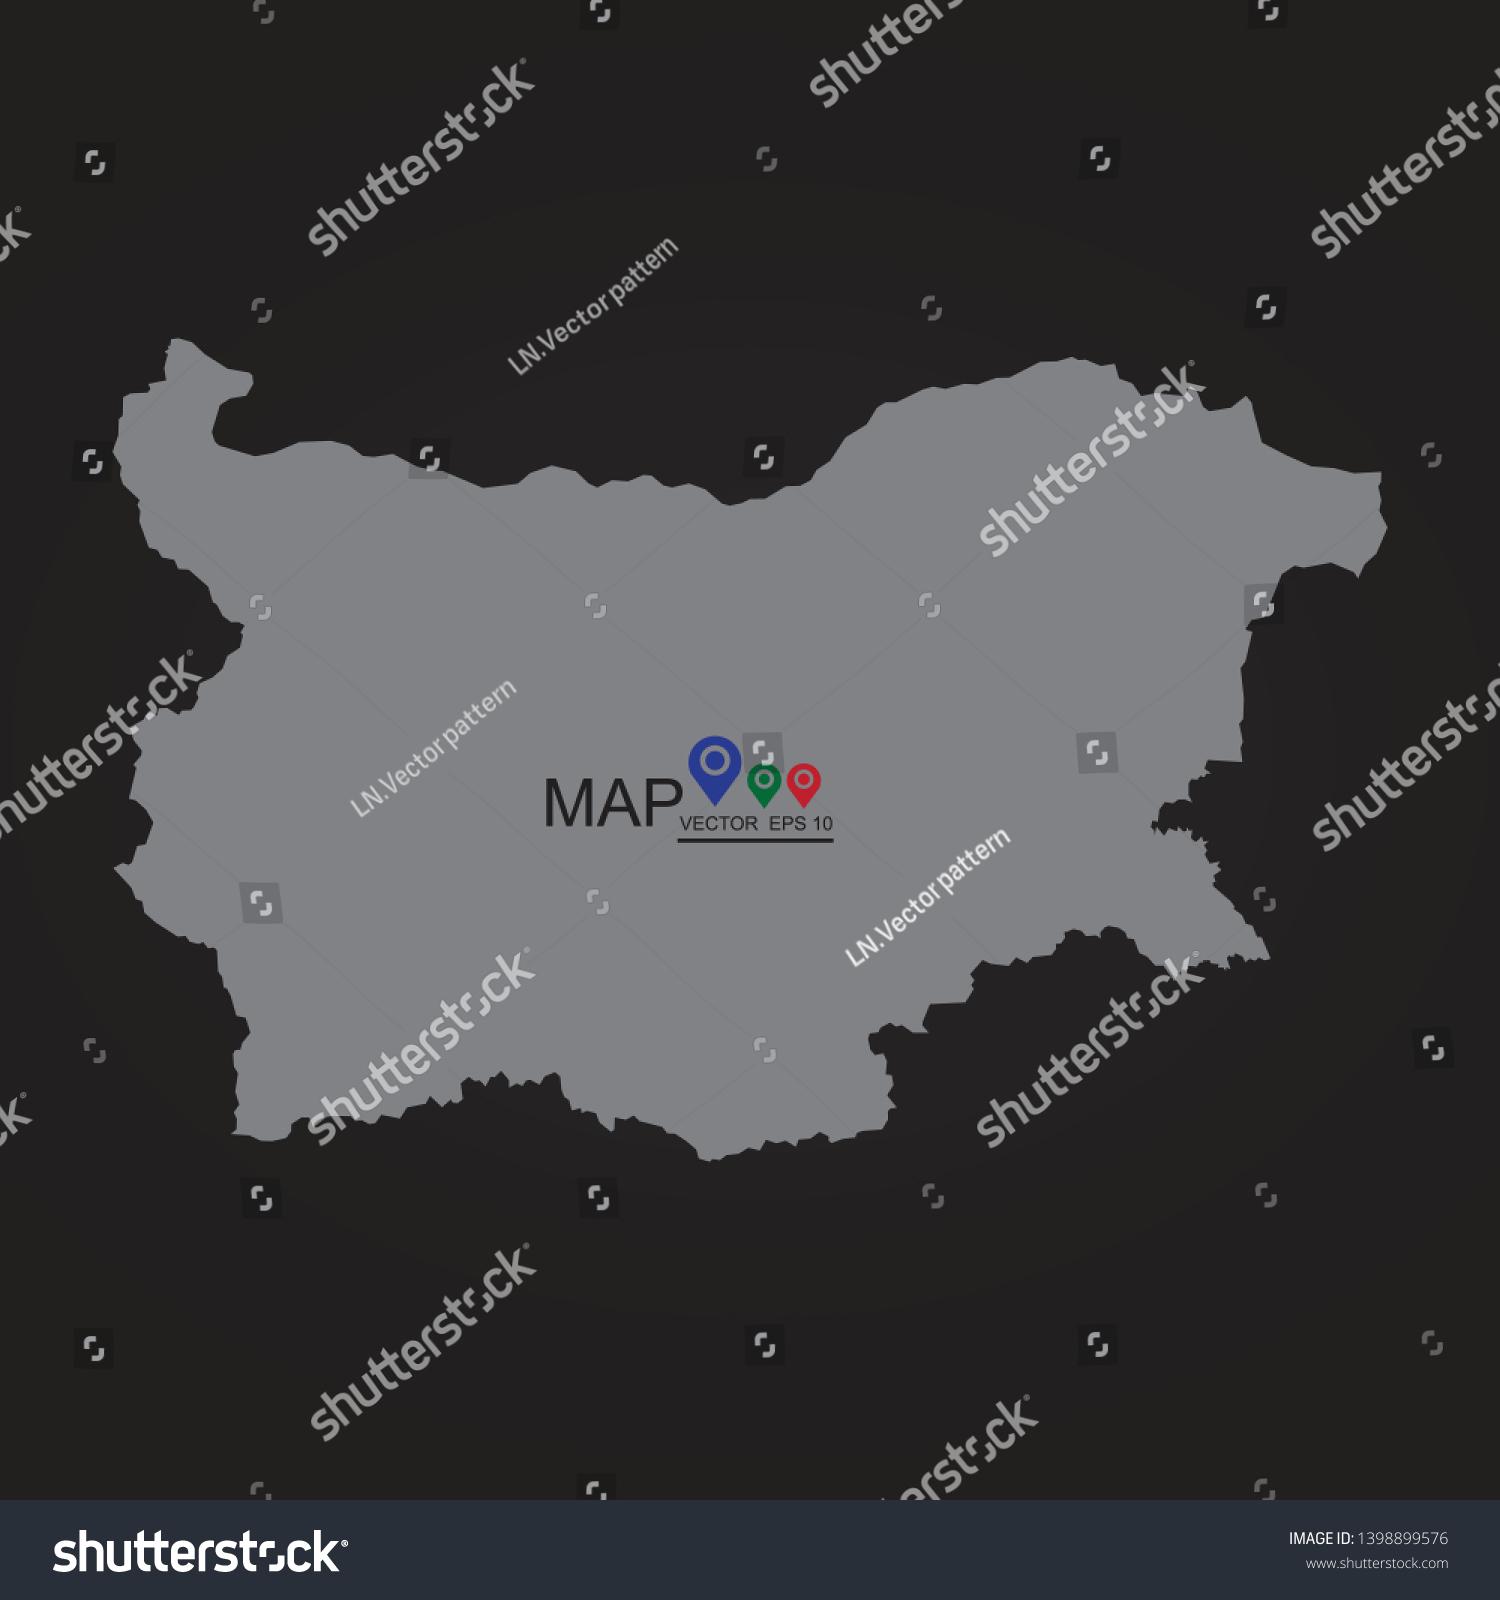 Map Bulgaria High Detailed Map Bulgaria Stock Vector ... on detailed map of ussr, detailed map of bosnia and herzegovina, detailed map of dalmatian coast, detailed map of scottish islands, detailed map of brunei, detailed map of arabia, detailed map of united arab emirates, detailed map romania, detailed map of sub saharan africa, detailed map of marshall islands, detailed map of congo, detailed map of the carribean, detailed map of holland netherlands, detailed map of american continent, detailed map of central african republic, detailed map of the dominican republic, detailed map of usa east coast, detailed map of countries, detailed map of indian ocean, detailed map of west bank,